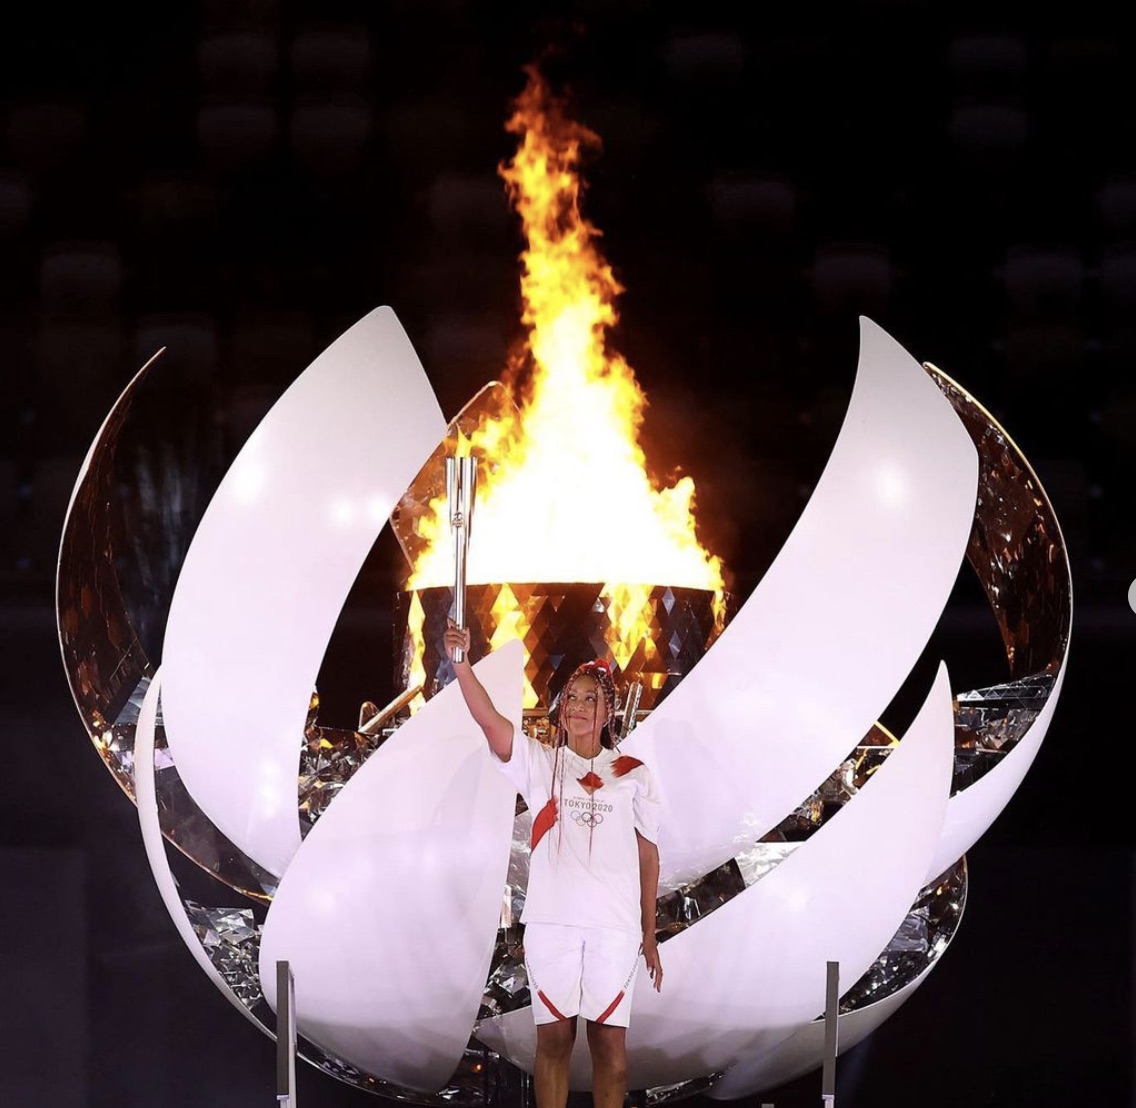 Naomi Osaka lighting the Olympic Cauldron